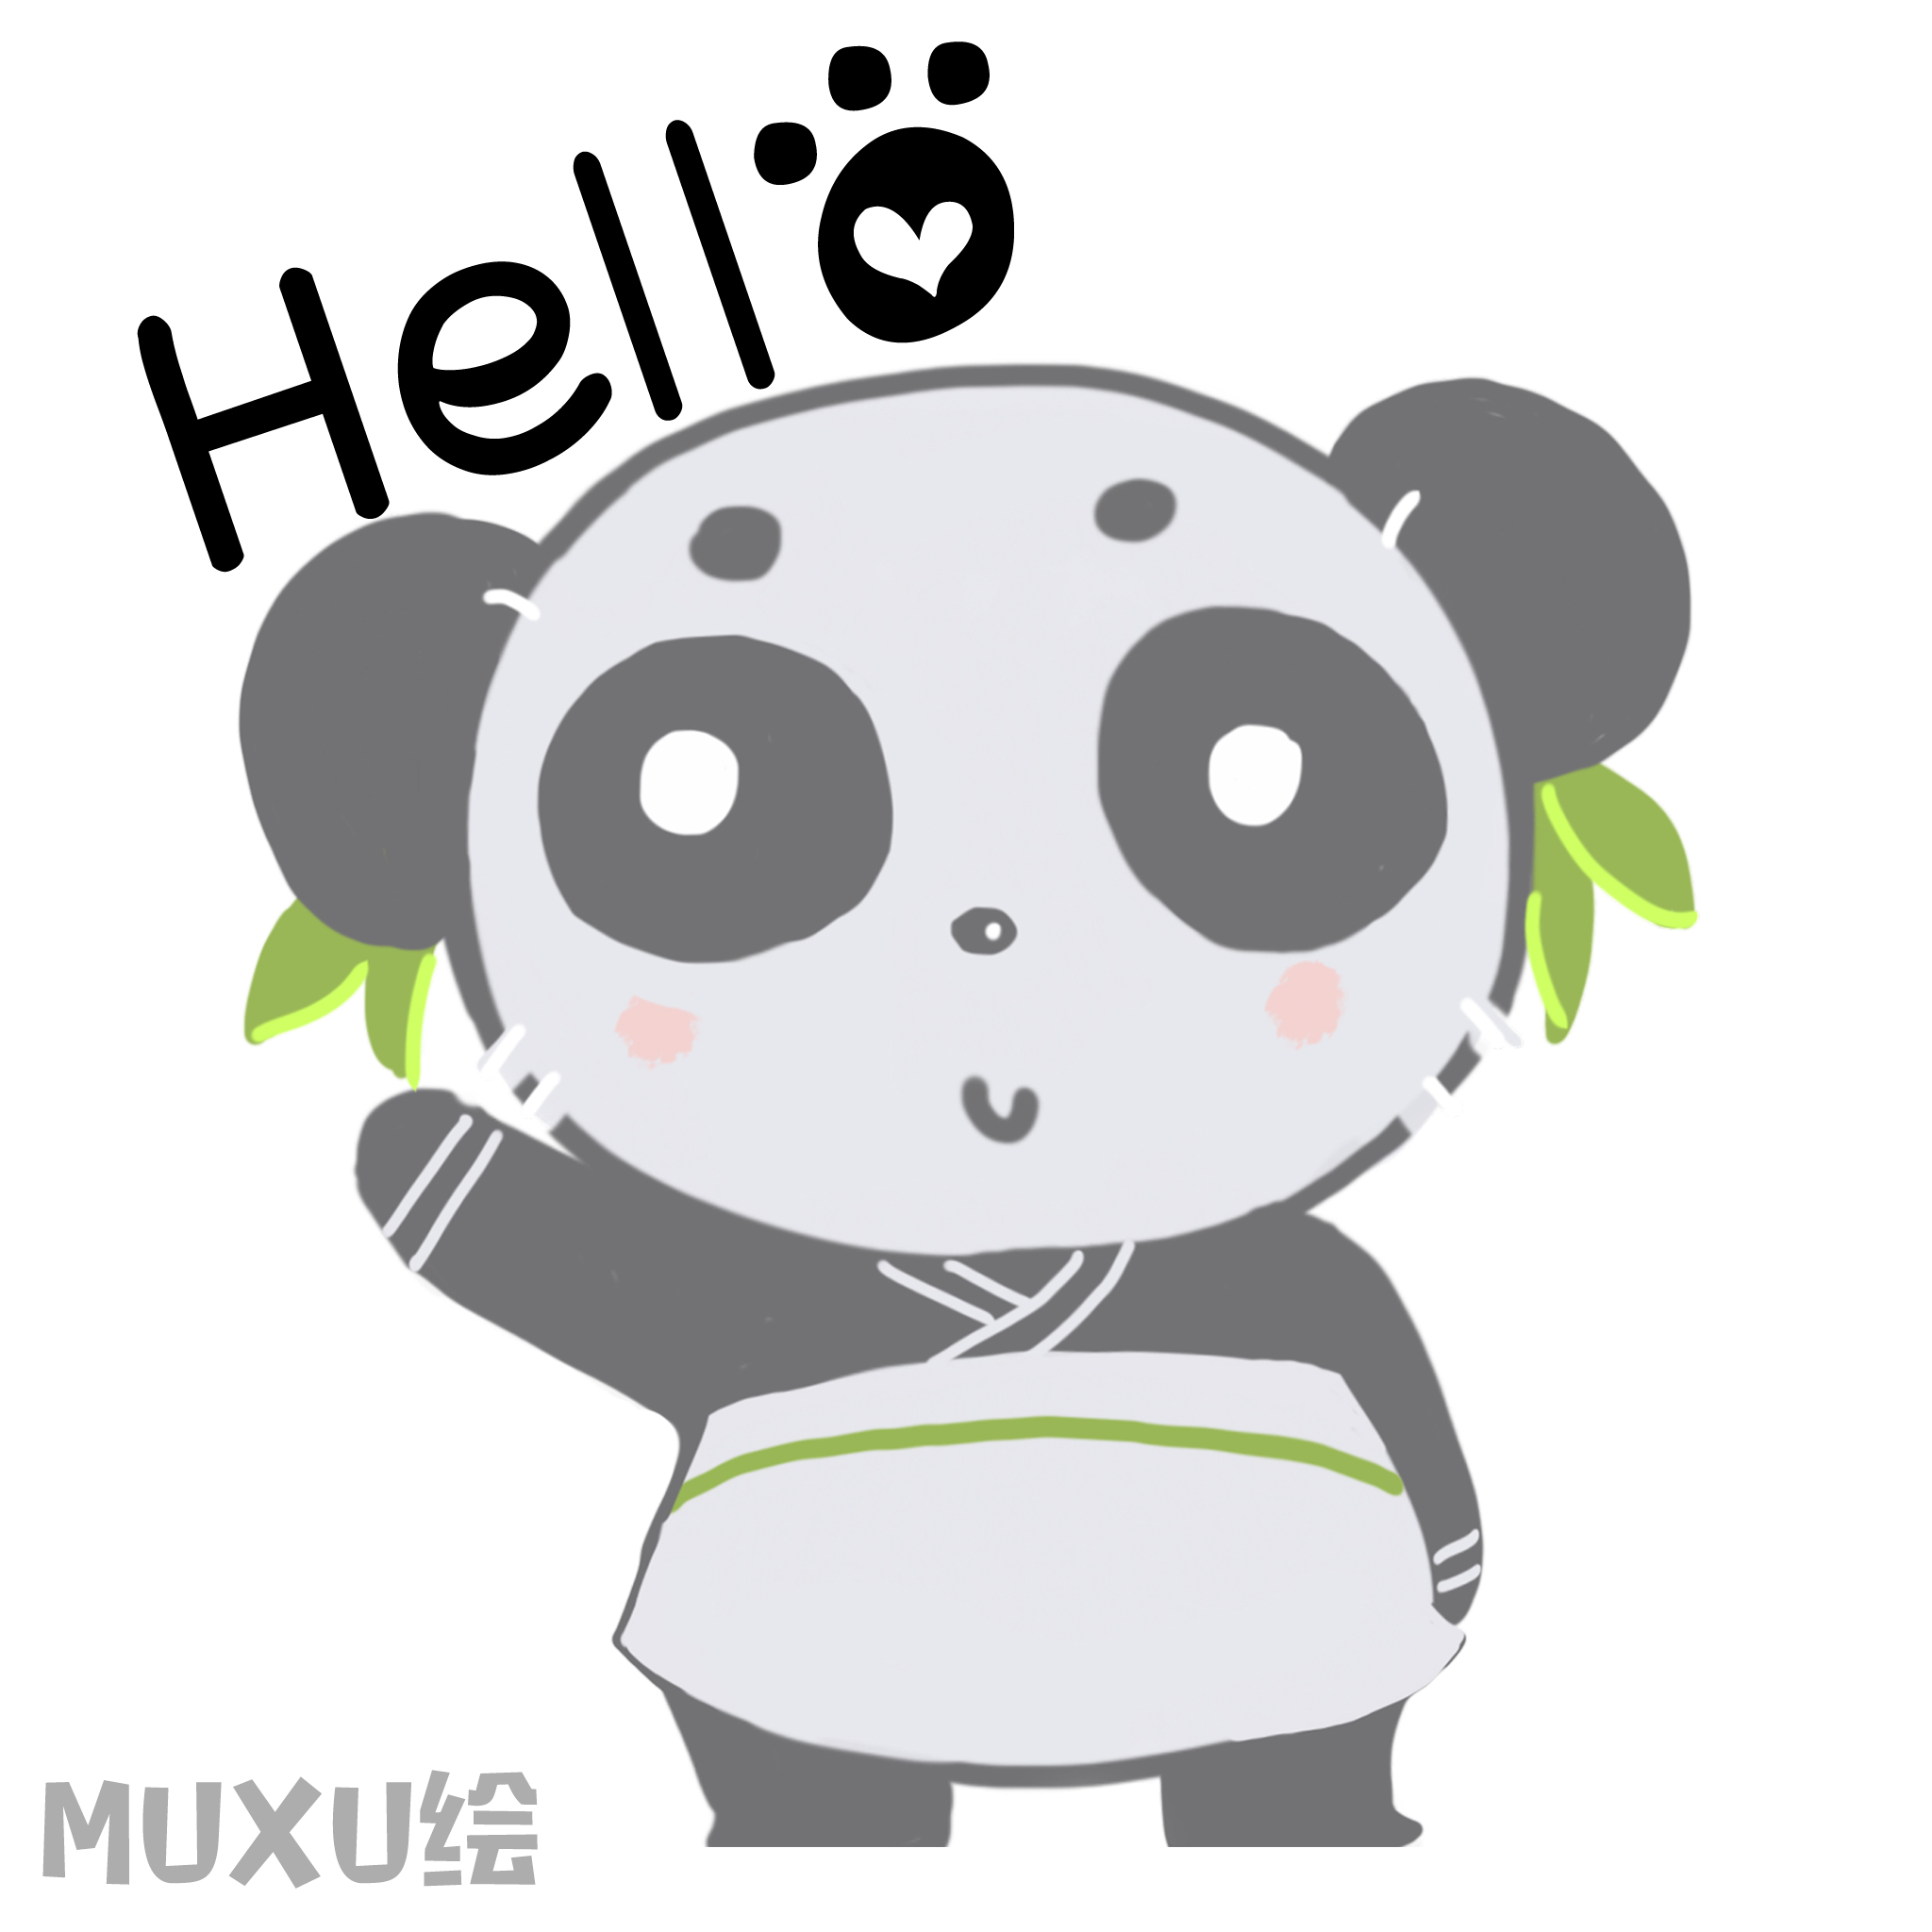 muxusunny_dear panda 动漫 网络表情 muxu绘 - 原创作品 - 站酷